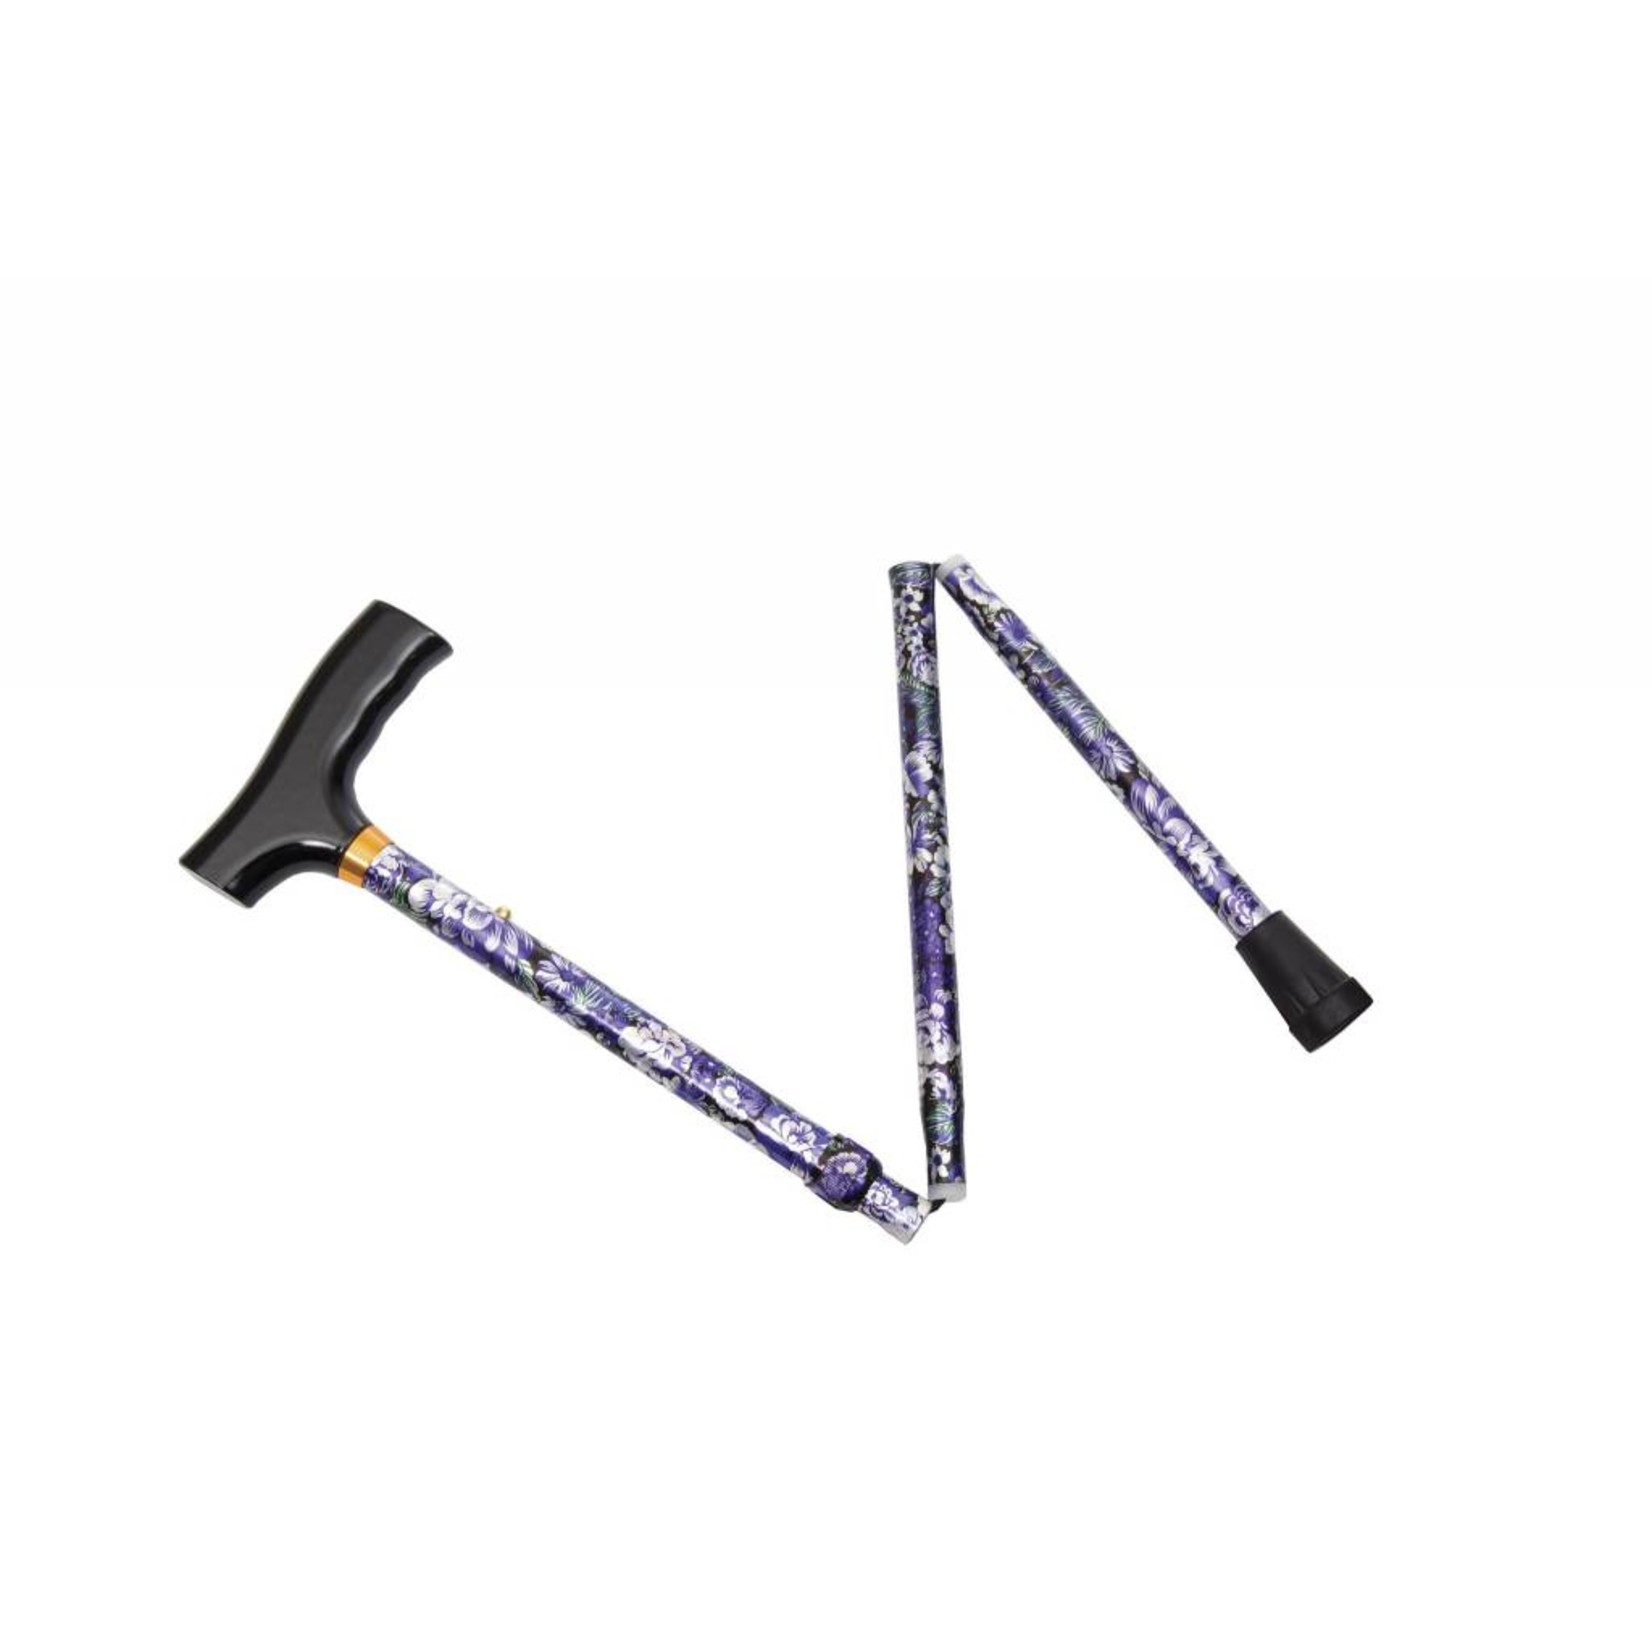 Essential Medical Cane Folding-Lilac